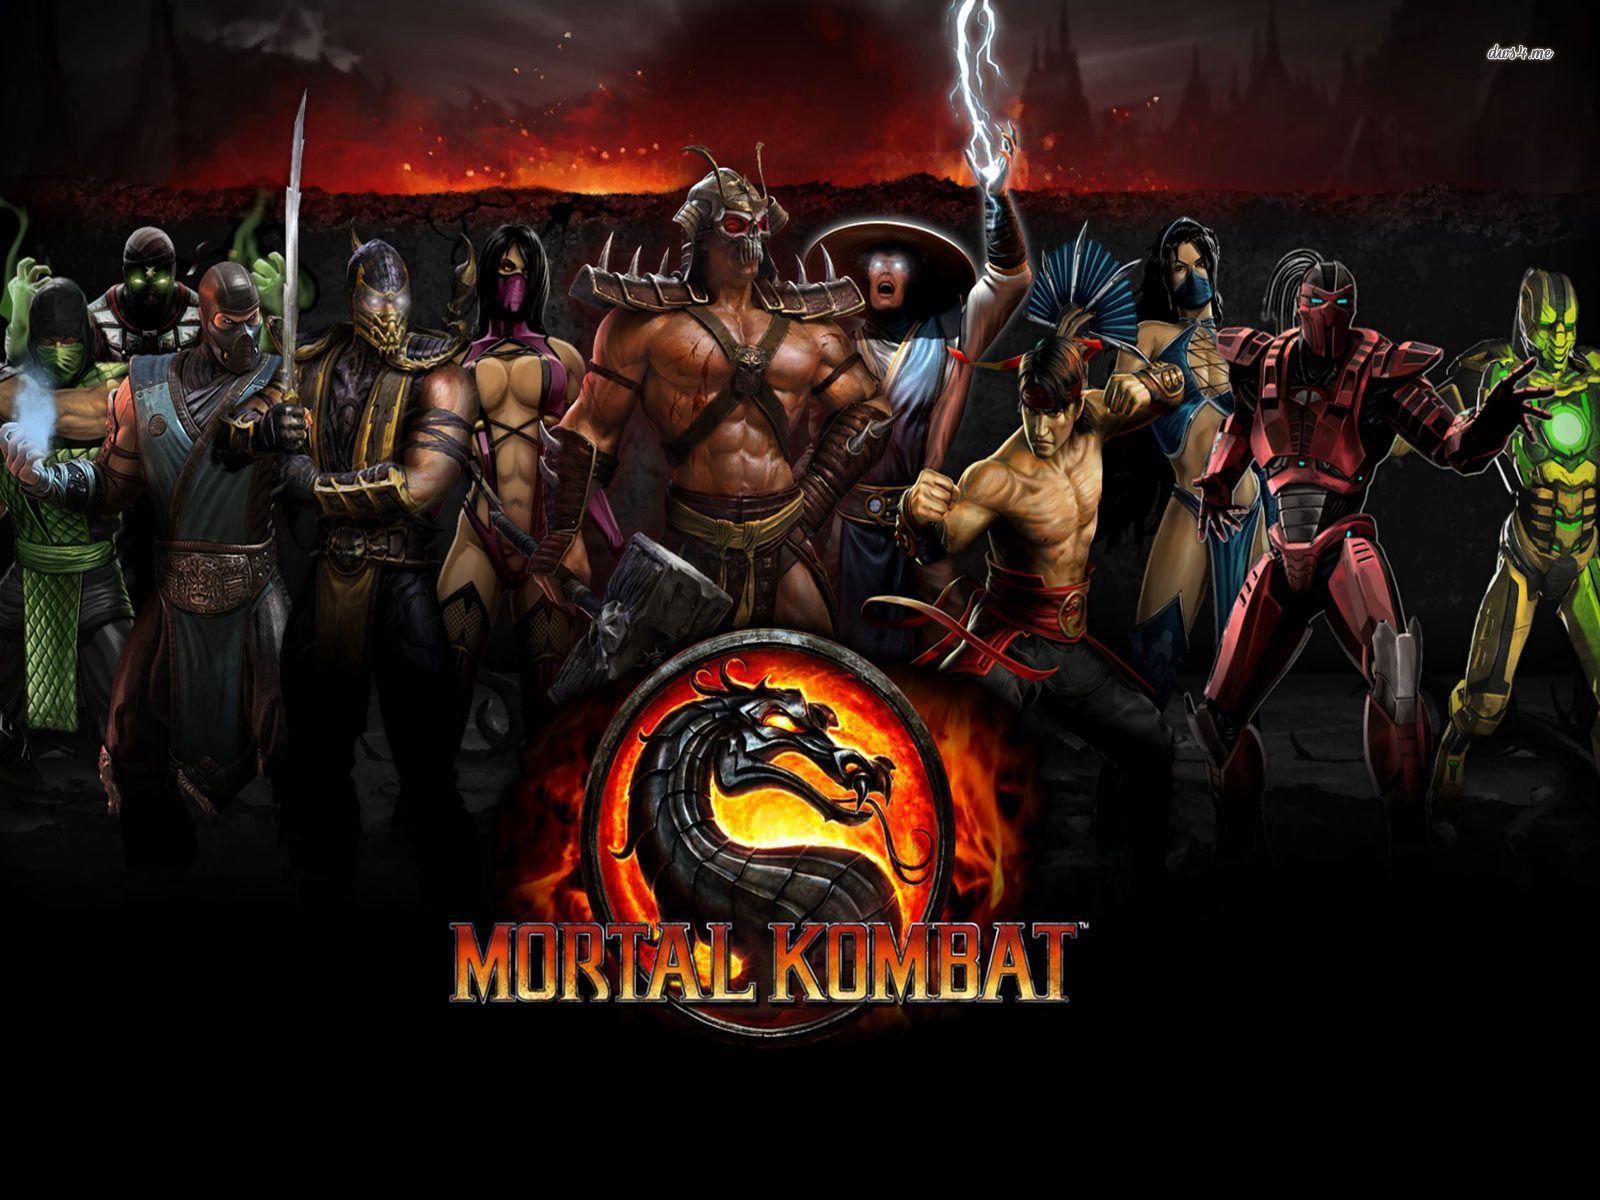 mortal kombat 1995 full movie in hindi free download